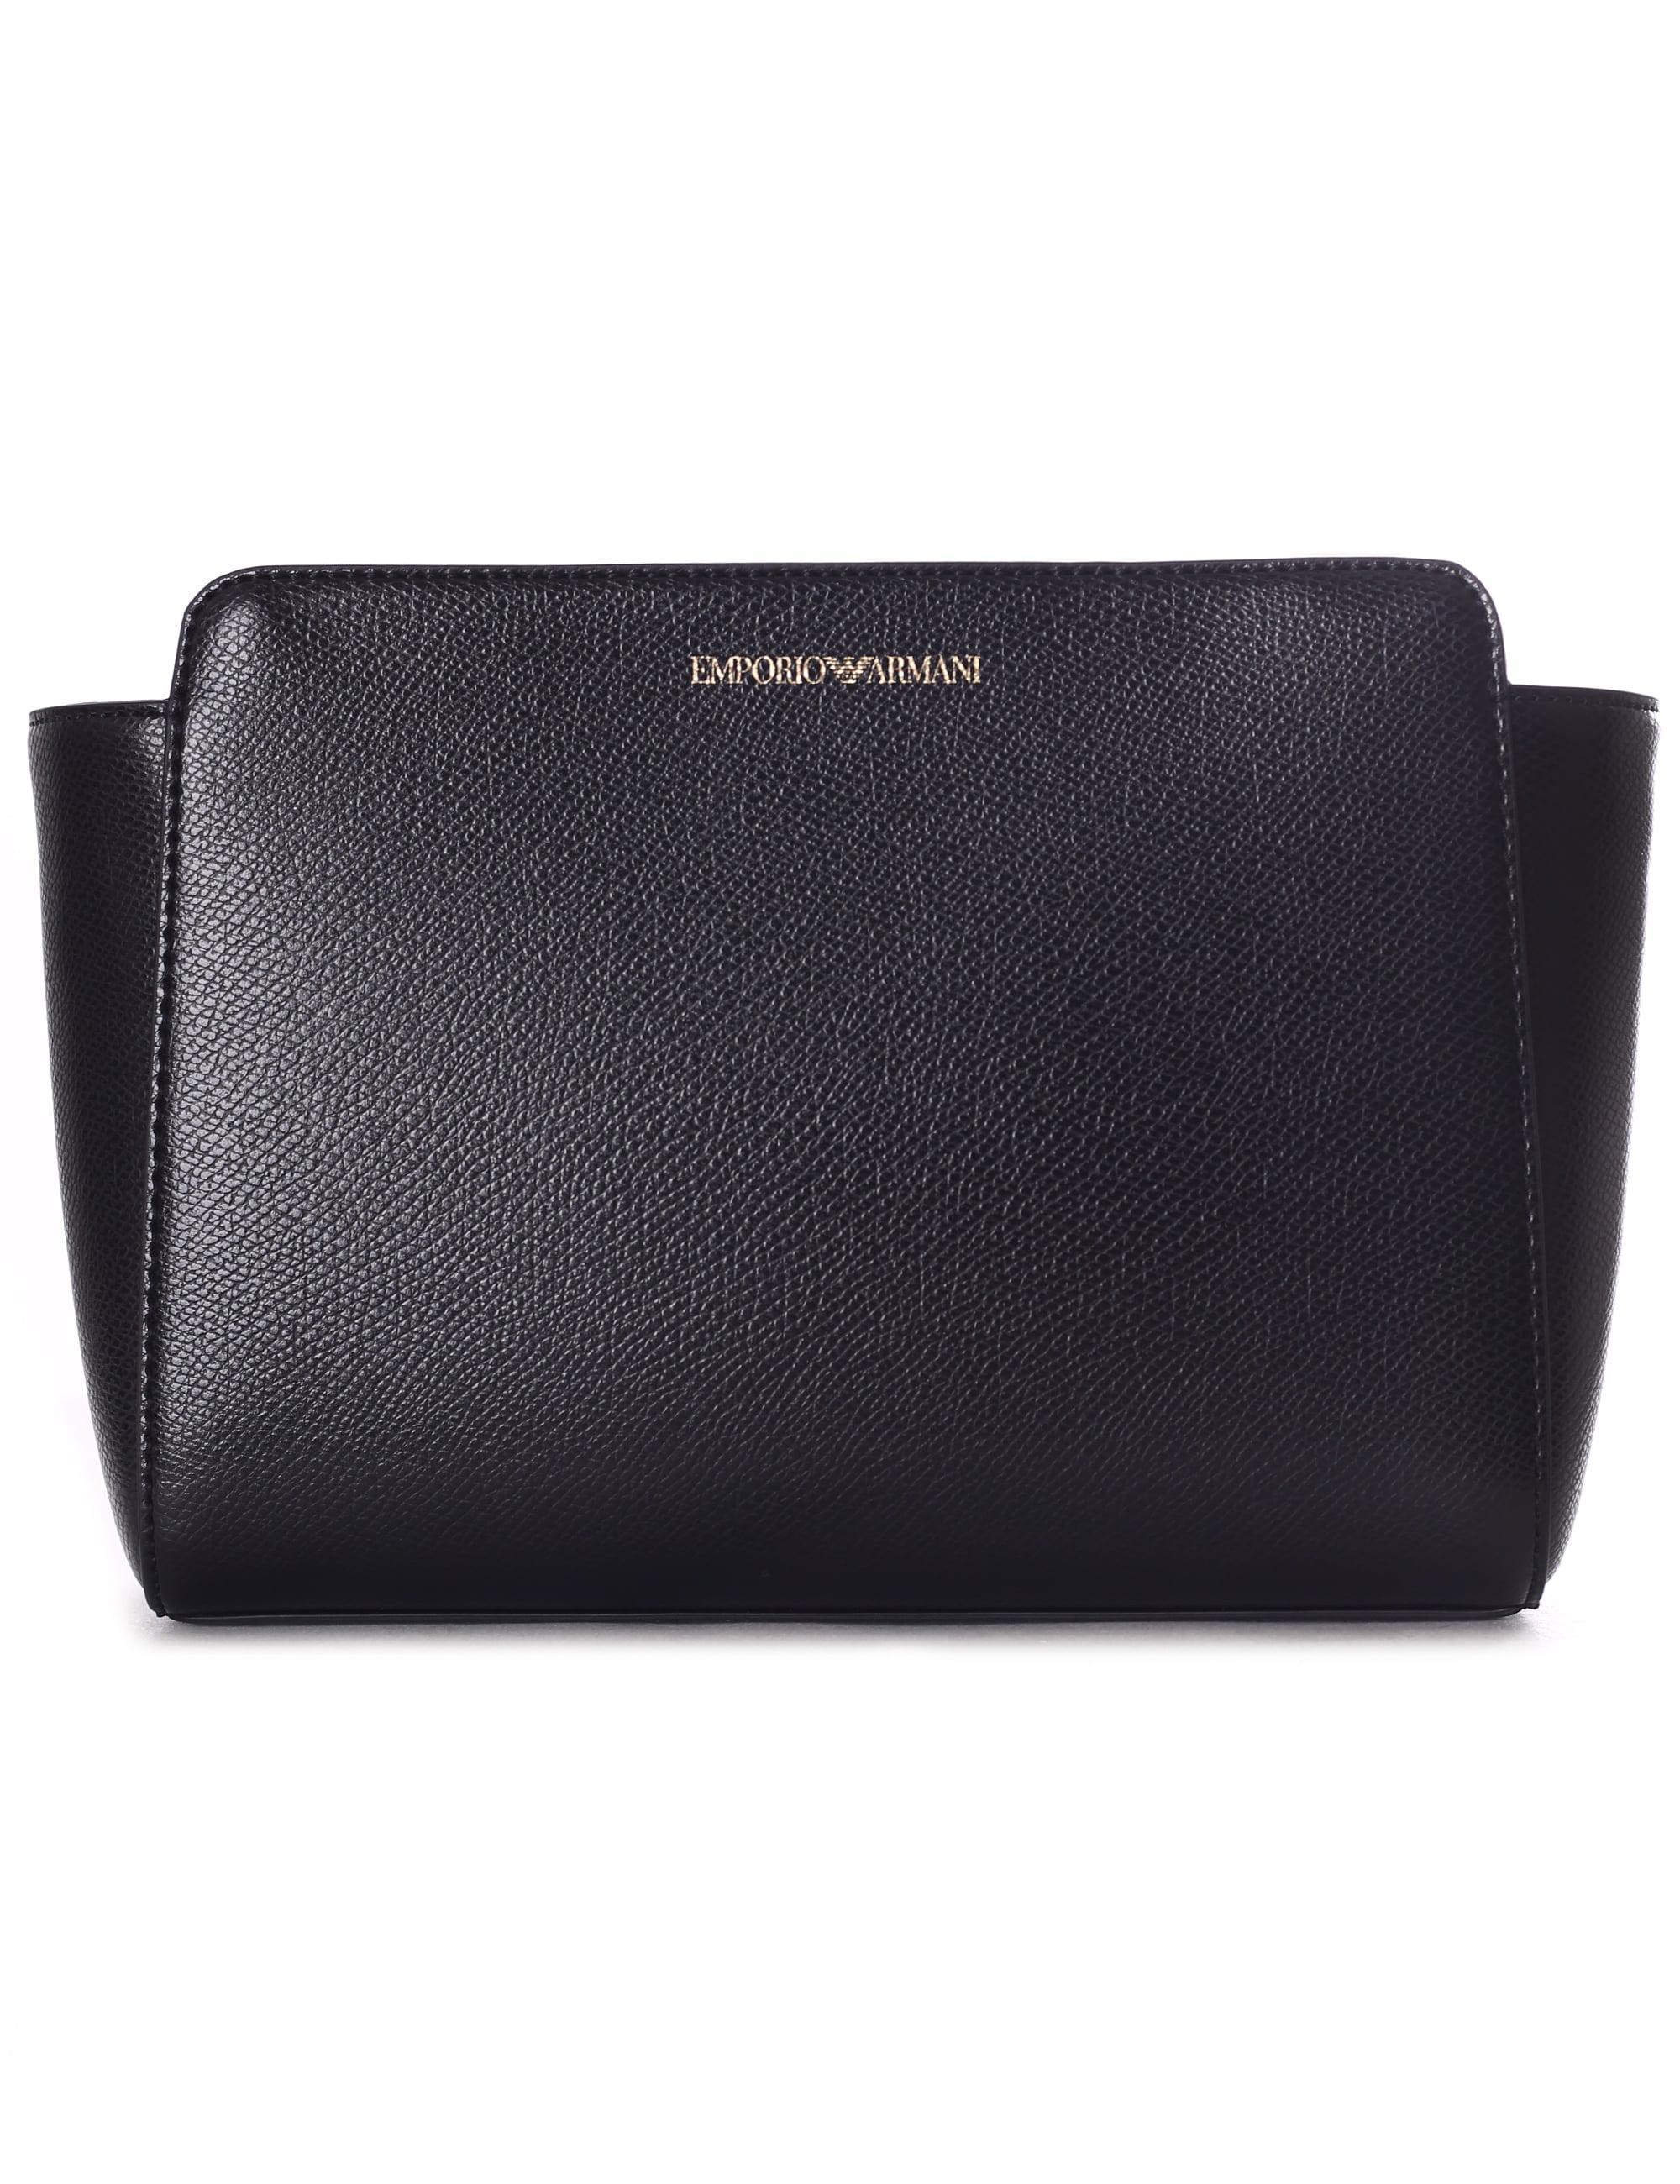 Emporio Armani Women s Medium Grain Crossbody Bag Black in Black - Lyst f89a48b097eca